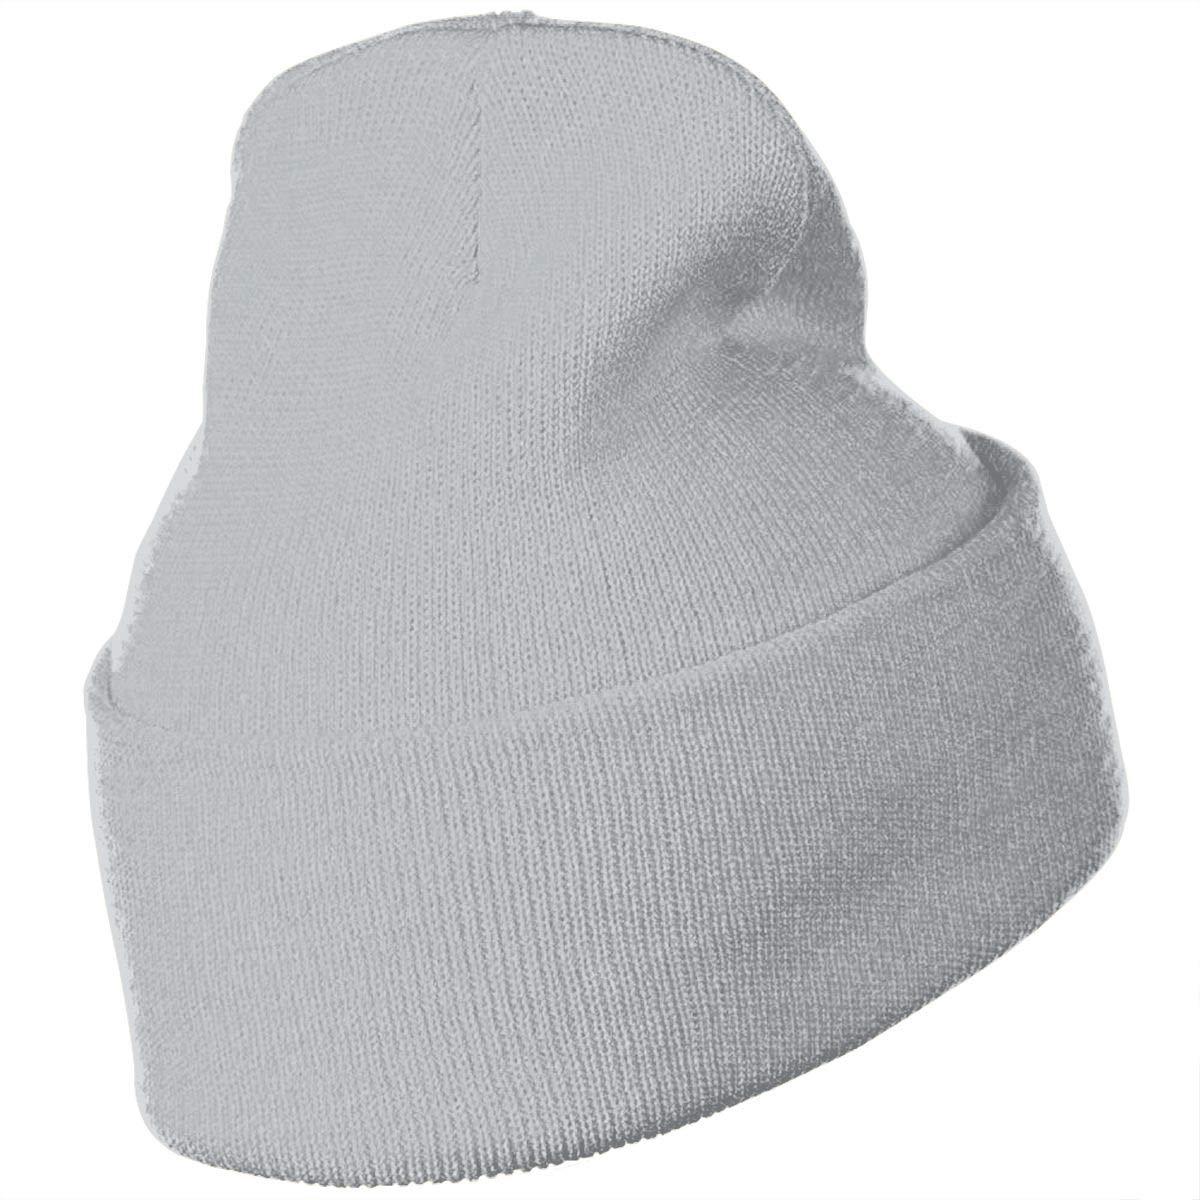 QZqDQ Unisex Fashion Knitted Hat Luxury Hip-Hop Cap